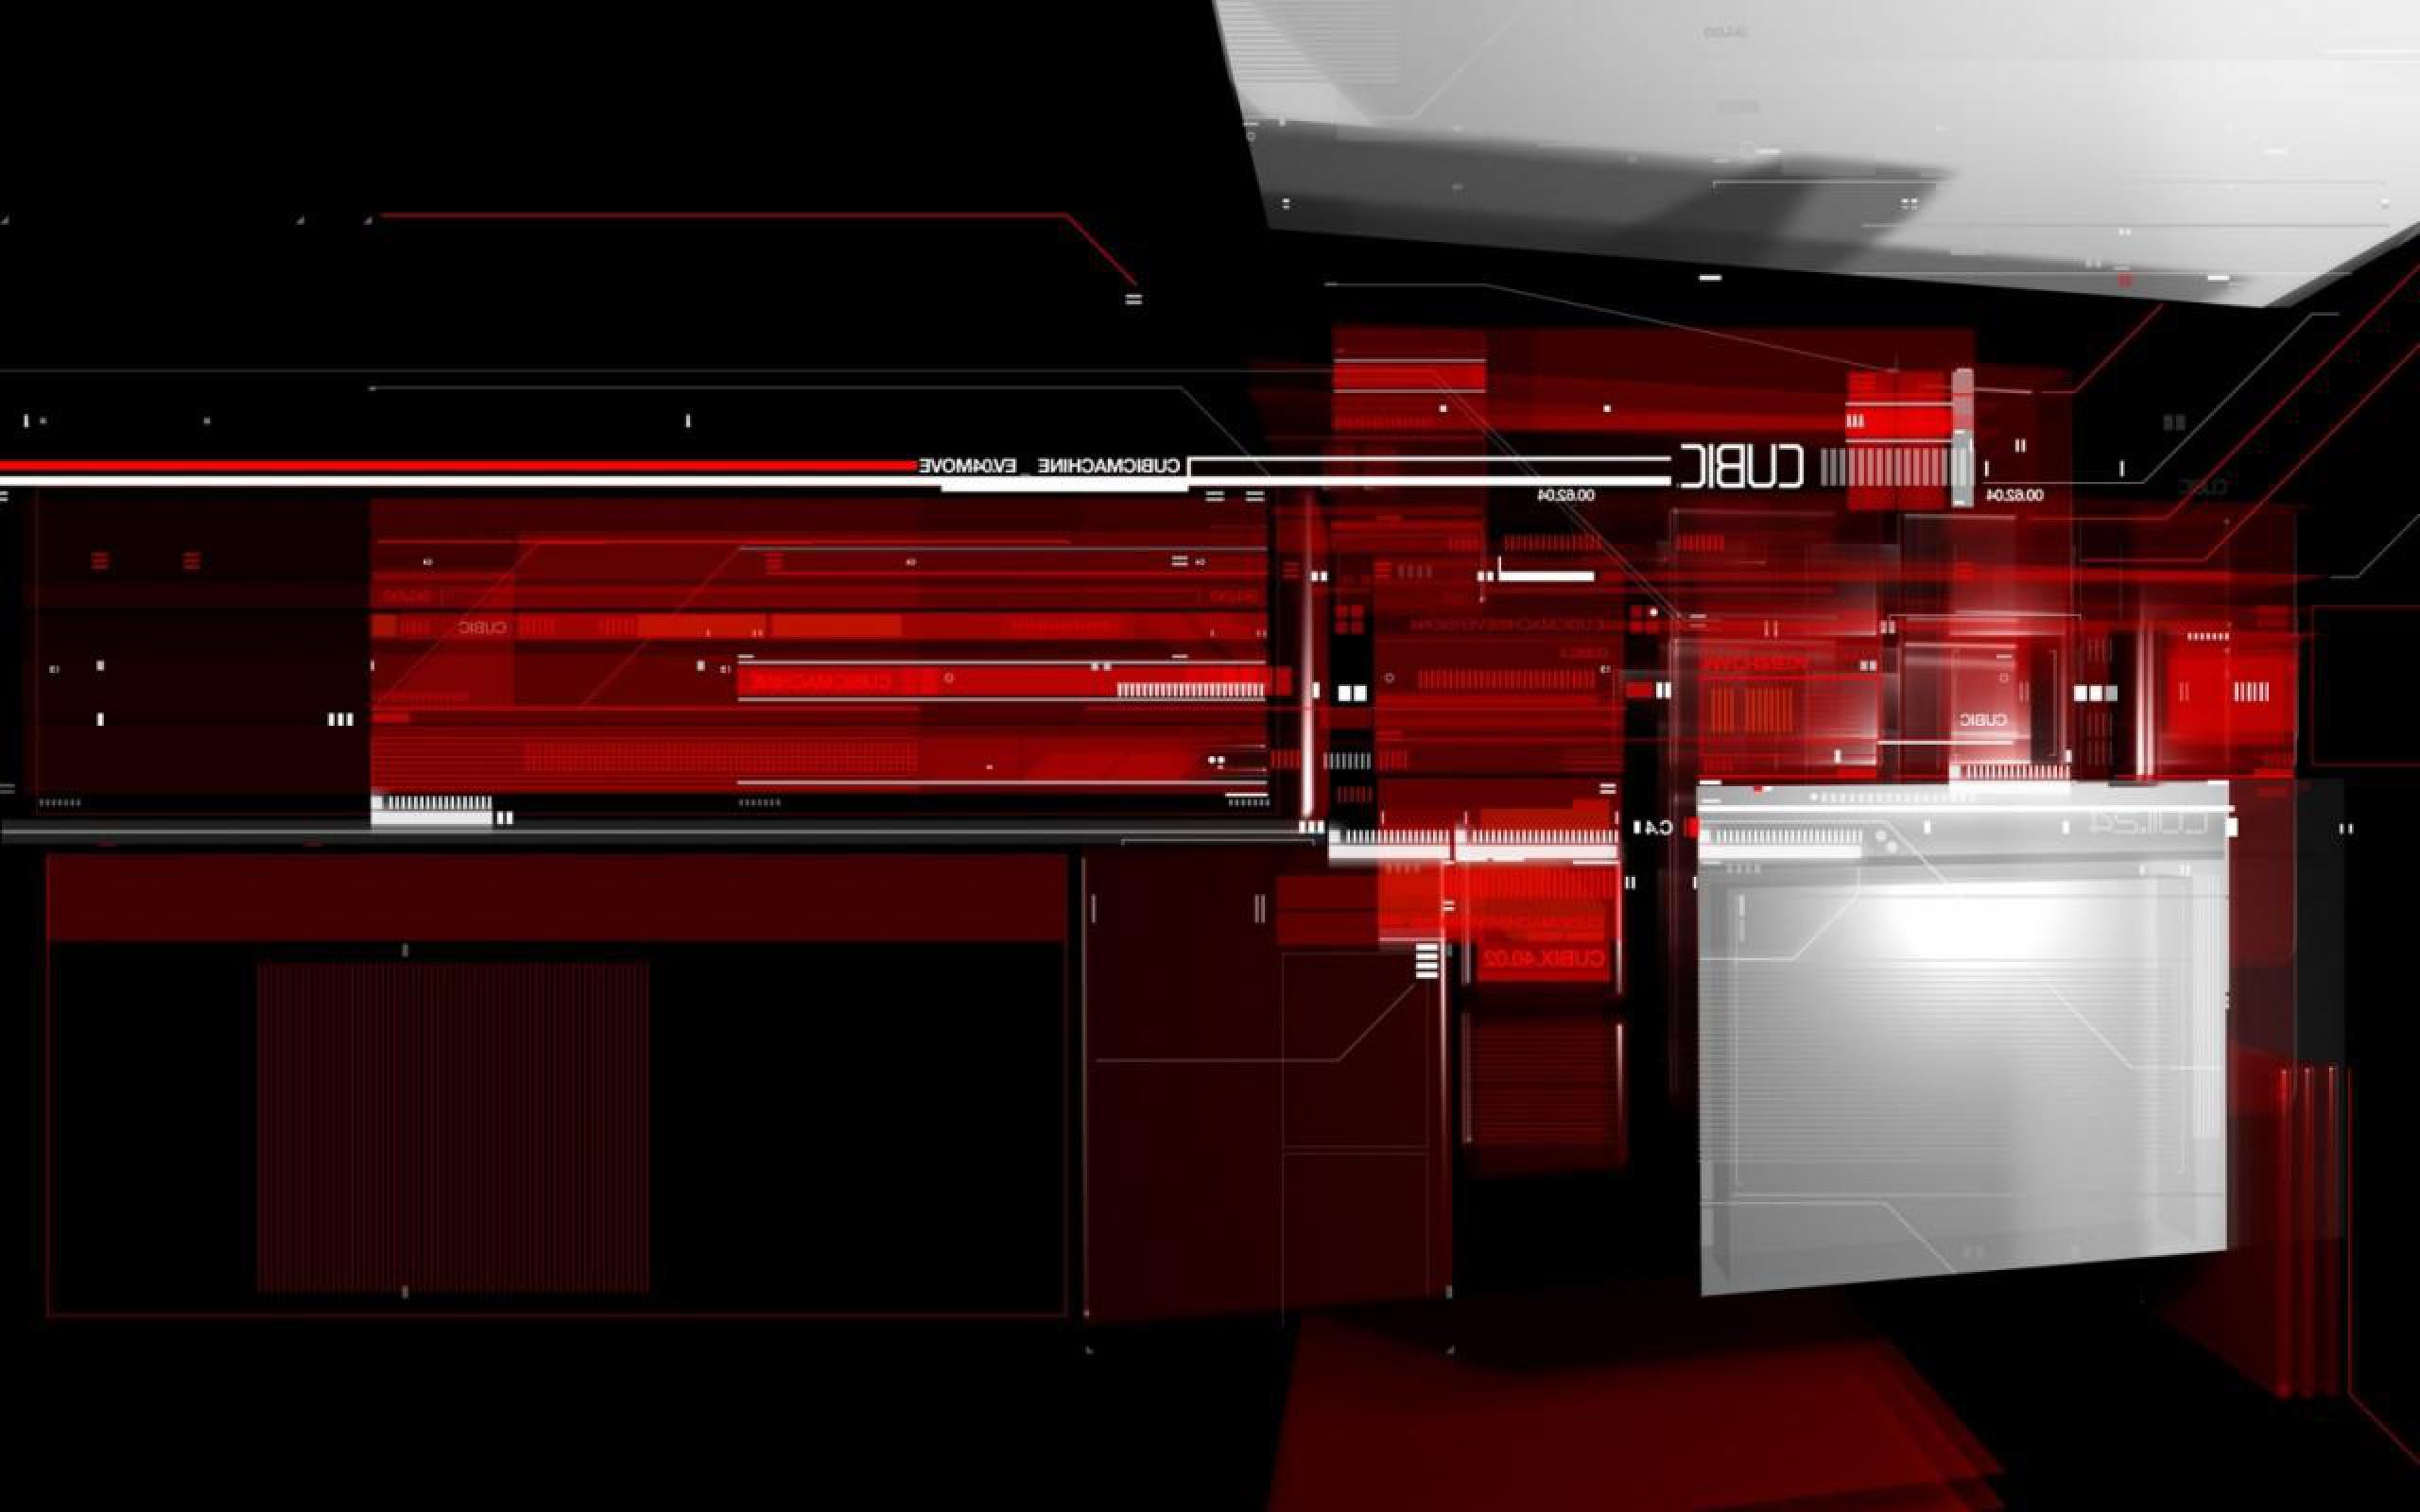 Cool 3d Wallpaper Websites 1 Digital Art Red Hd Wallpapers Background Images